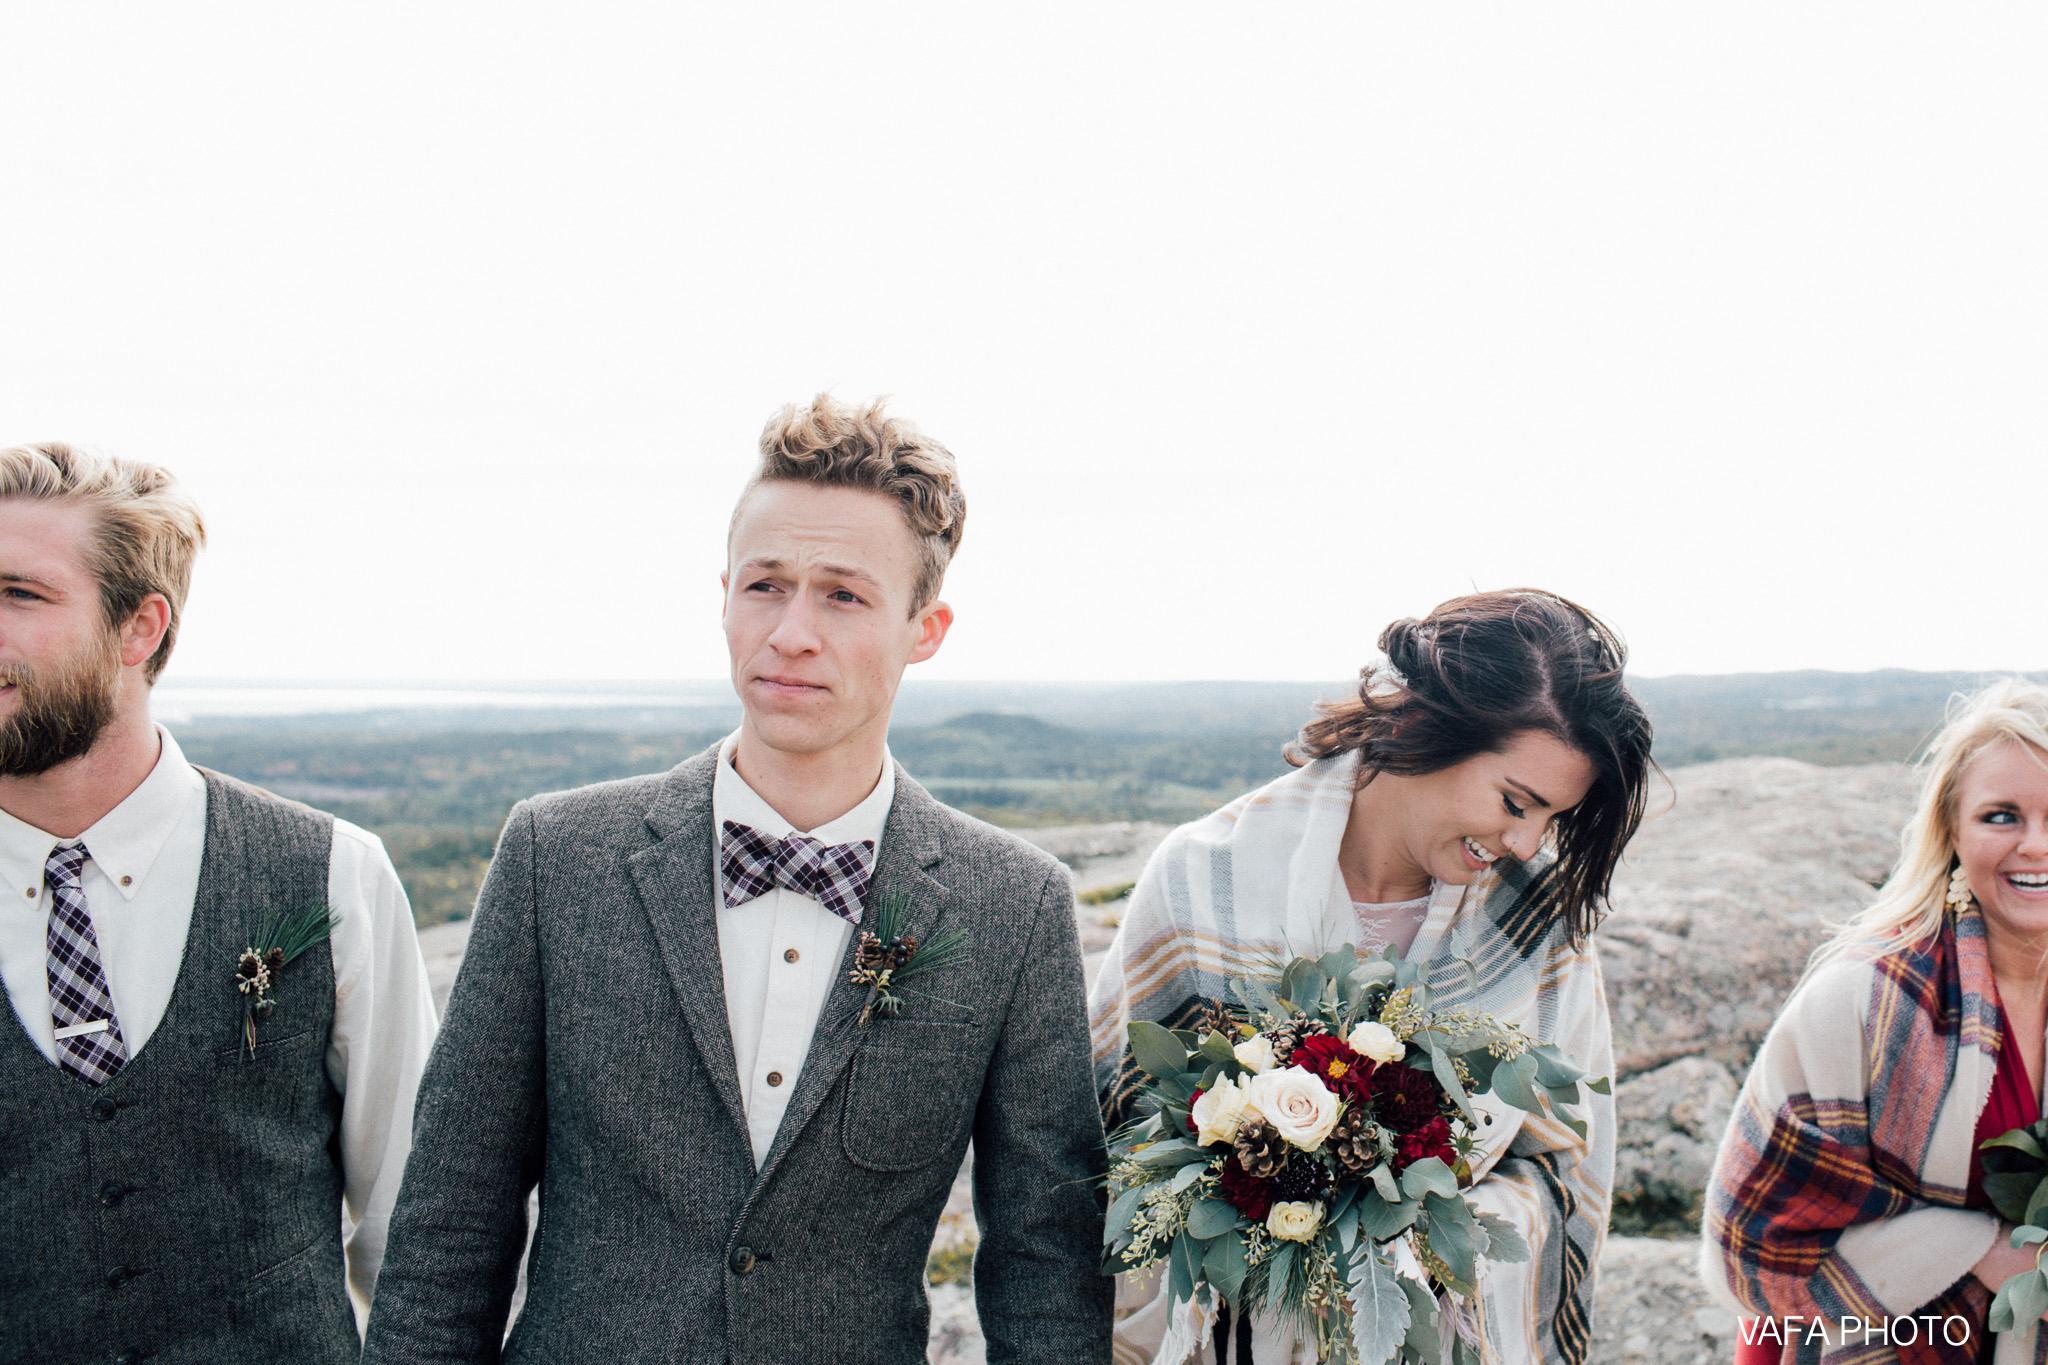 Hogback-Mountain-Wedding-Chelsea-Josh-Vafa-Photo-316.jpg